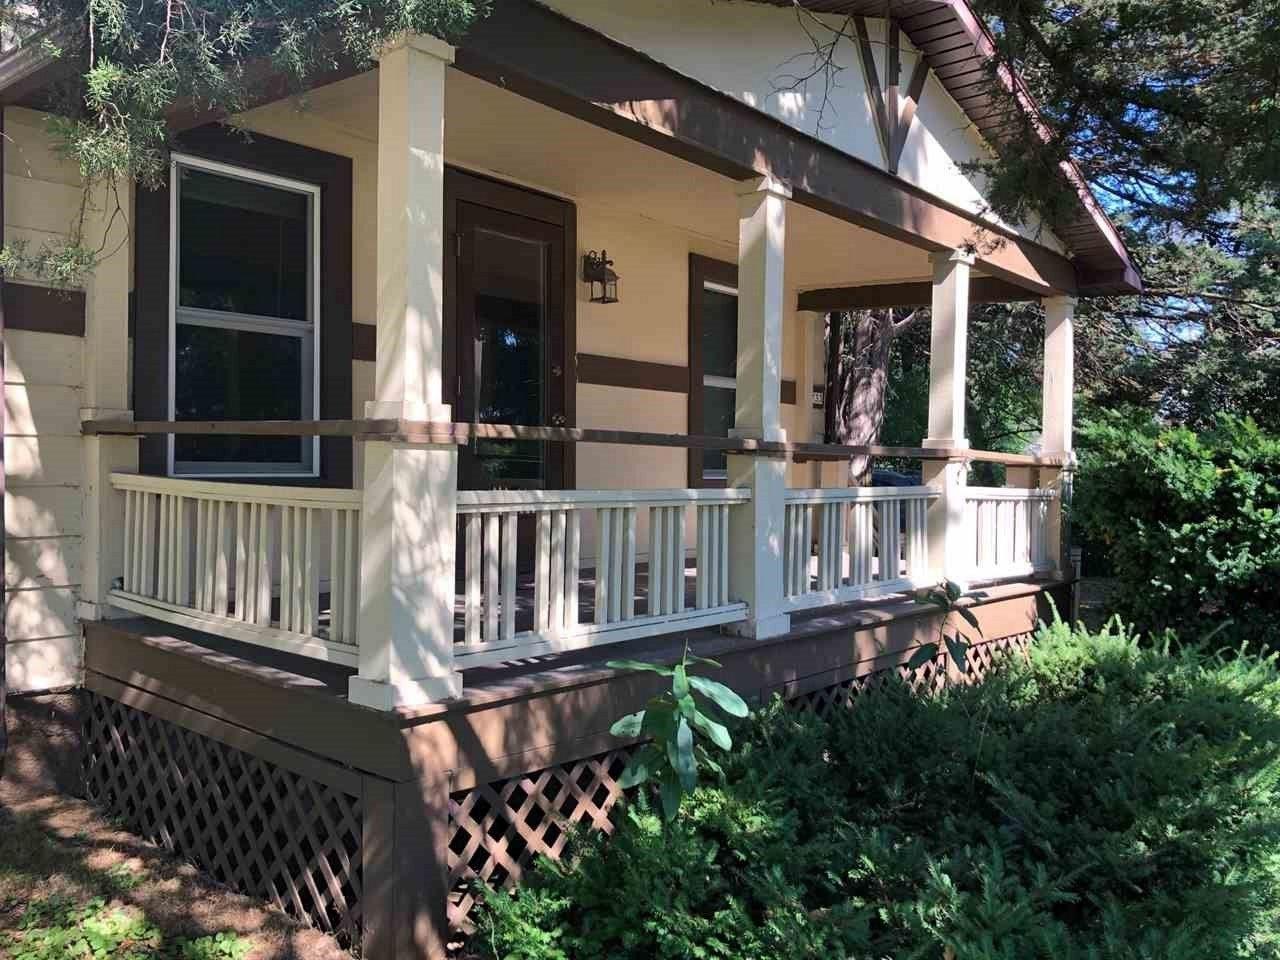 733 Janesville St, Oregon, WI 53575 - #: 1891011